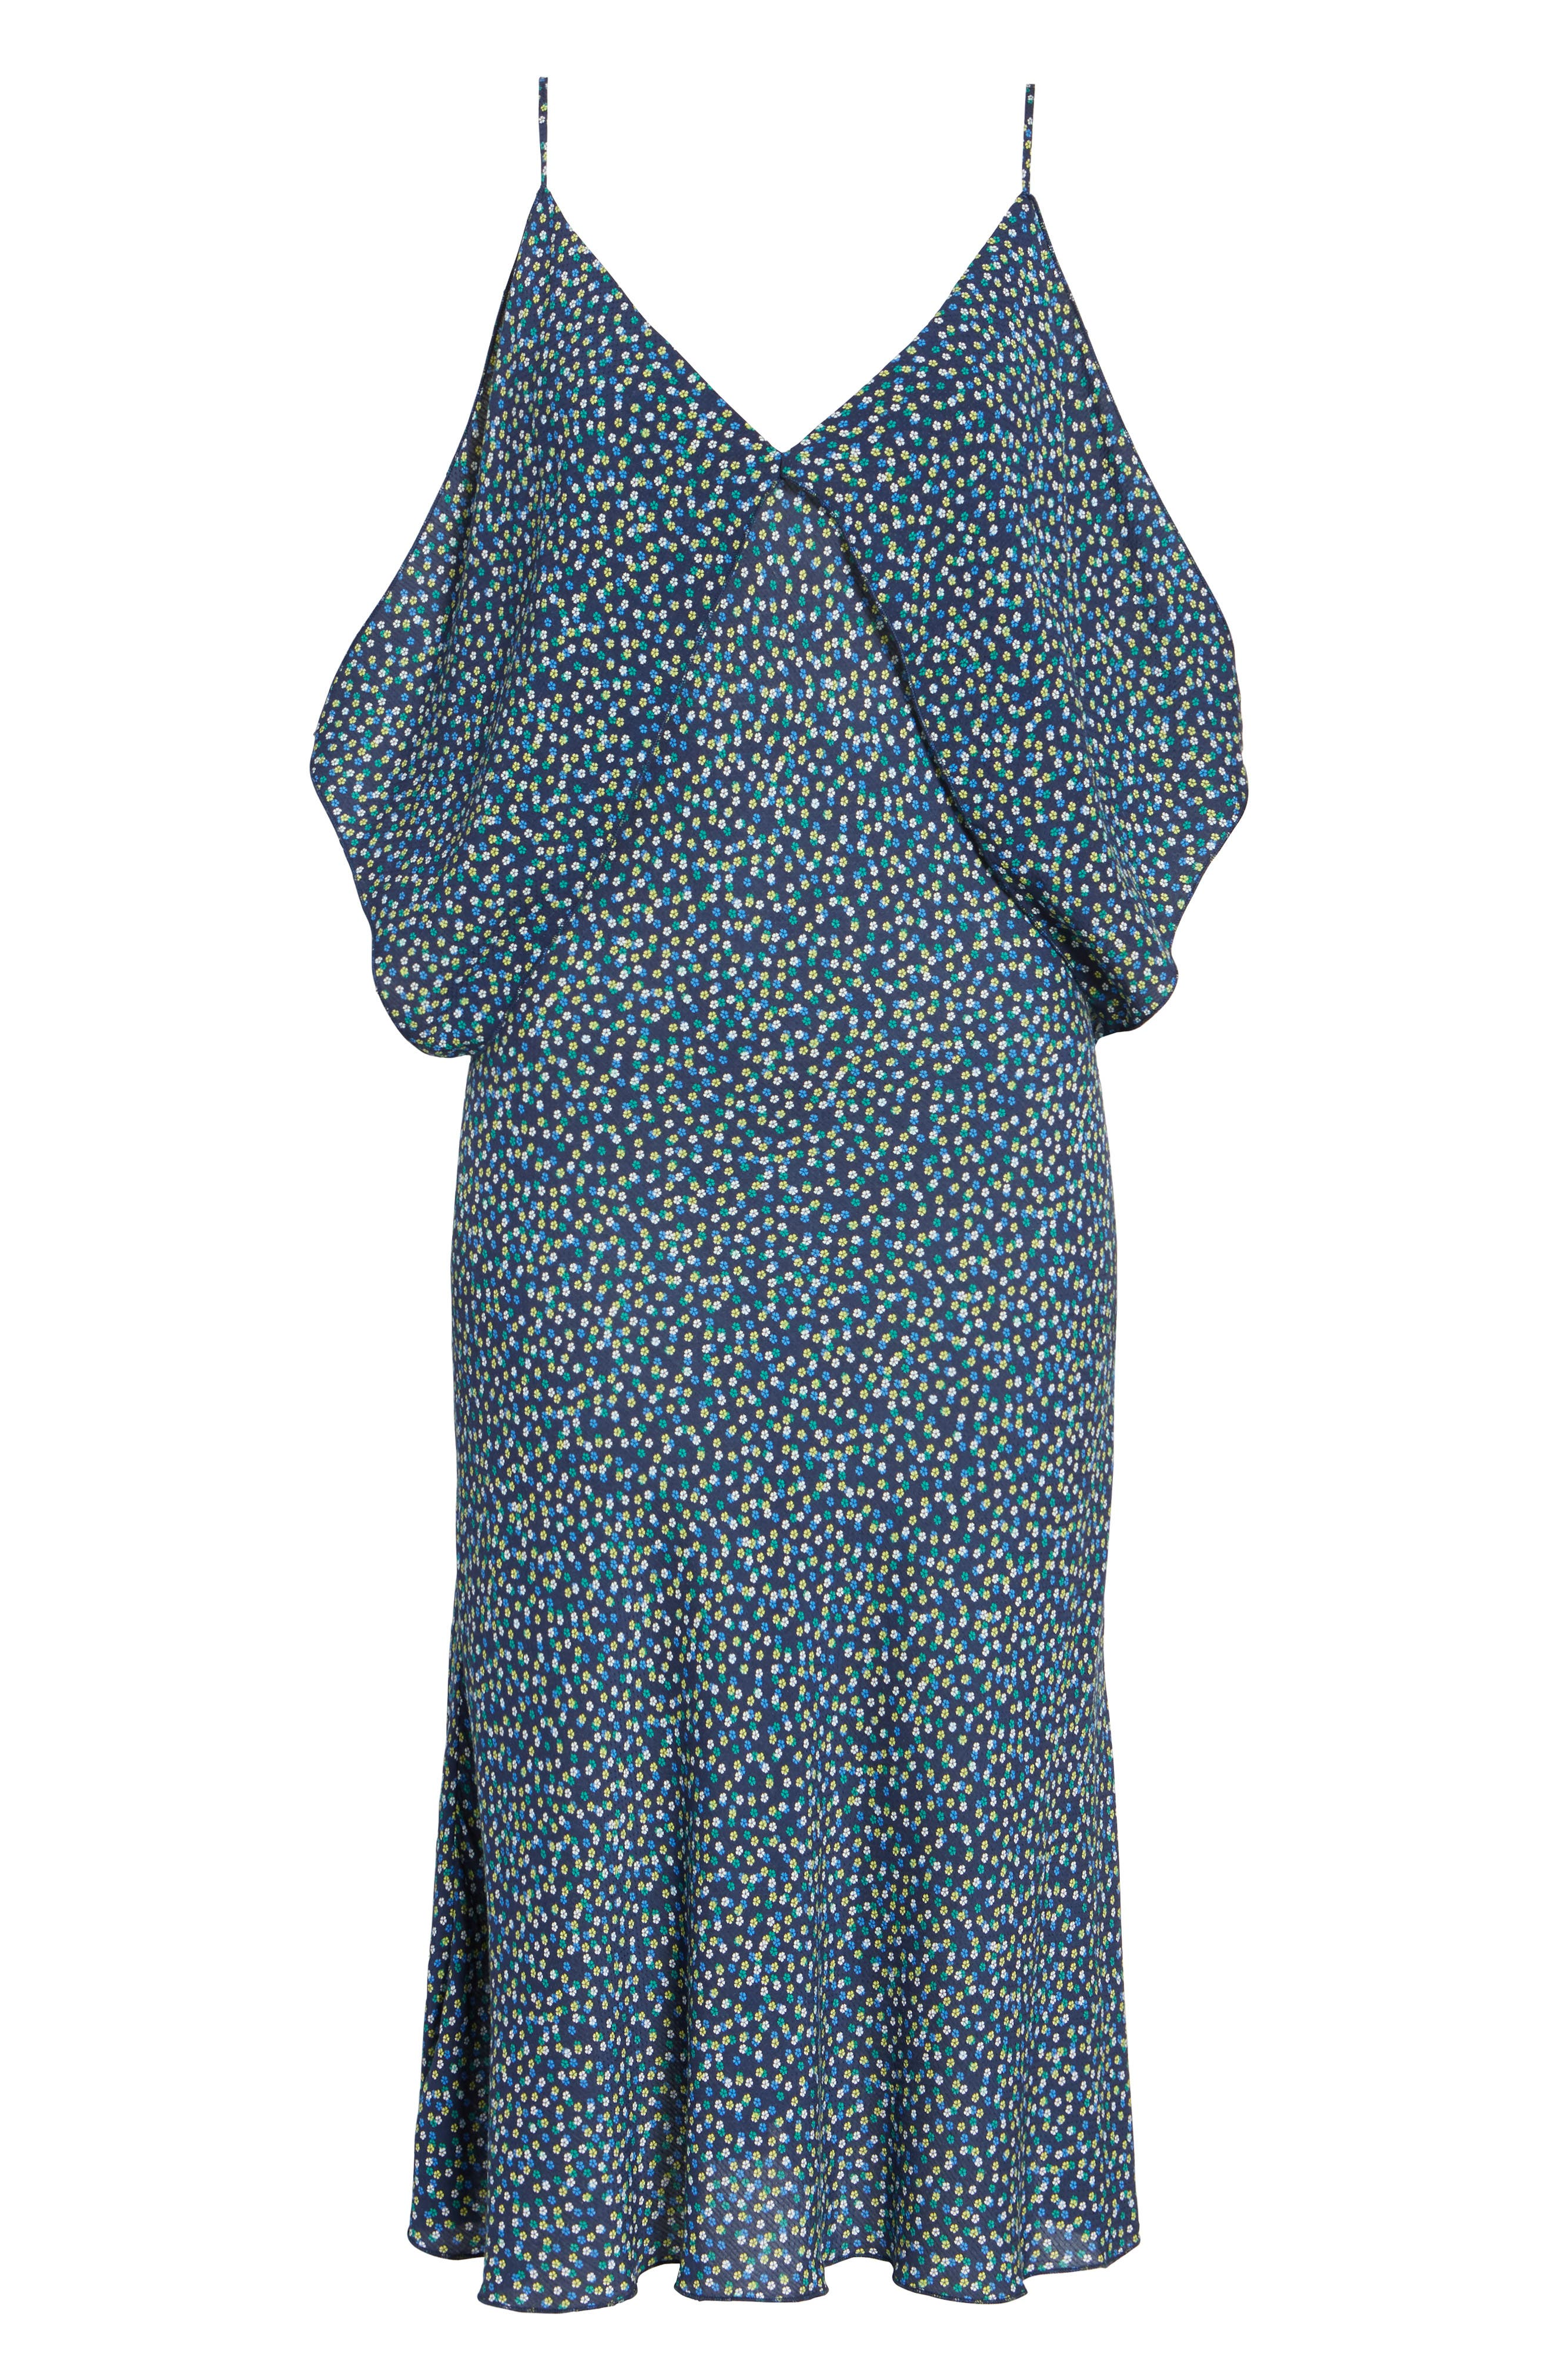 Bodacious Floral Midi Dress,                             Alternate thumbnail 6, color,                             461